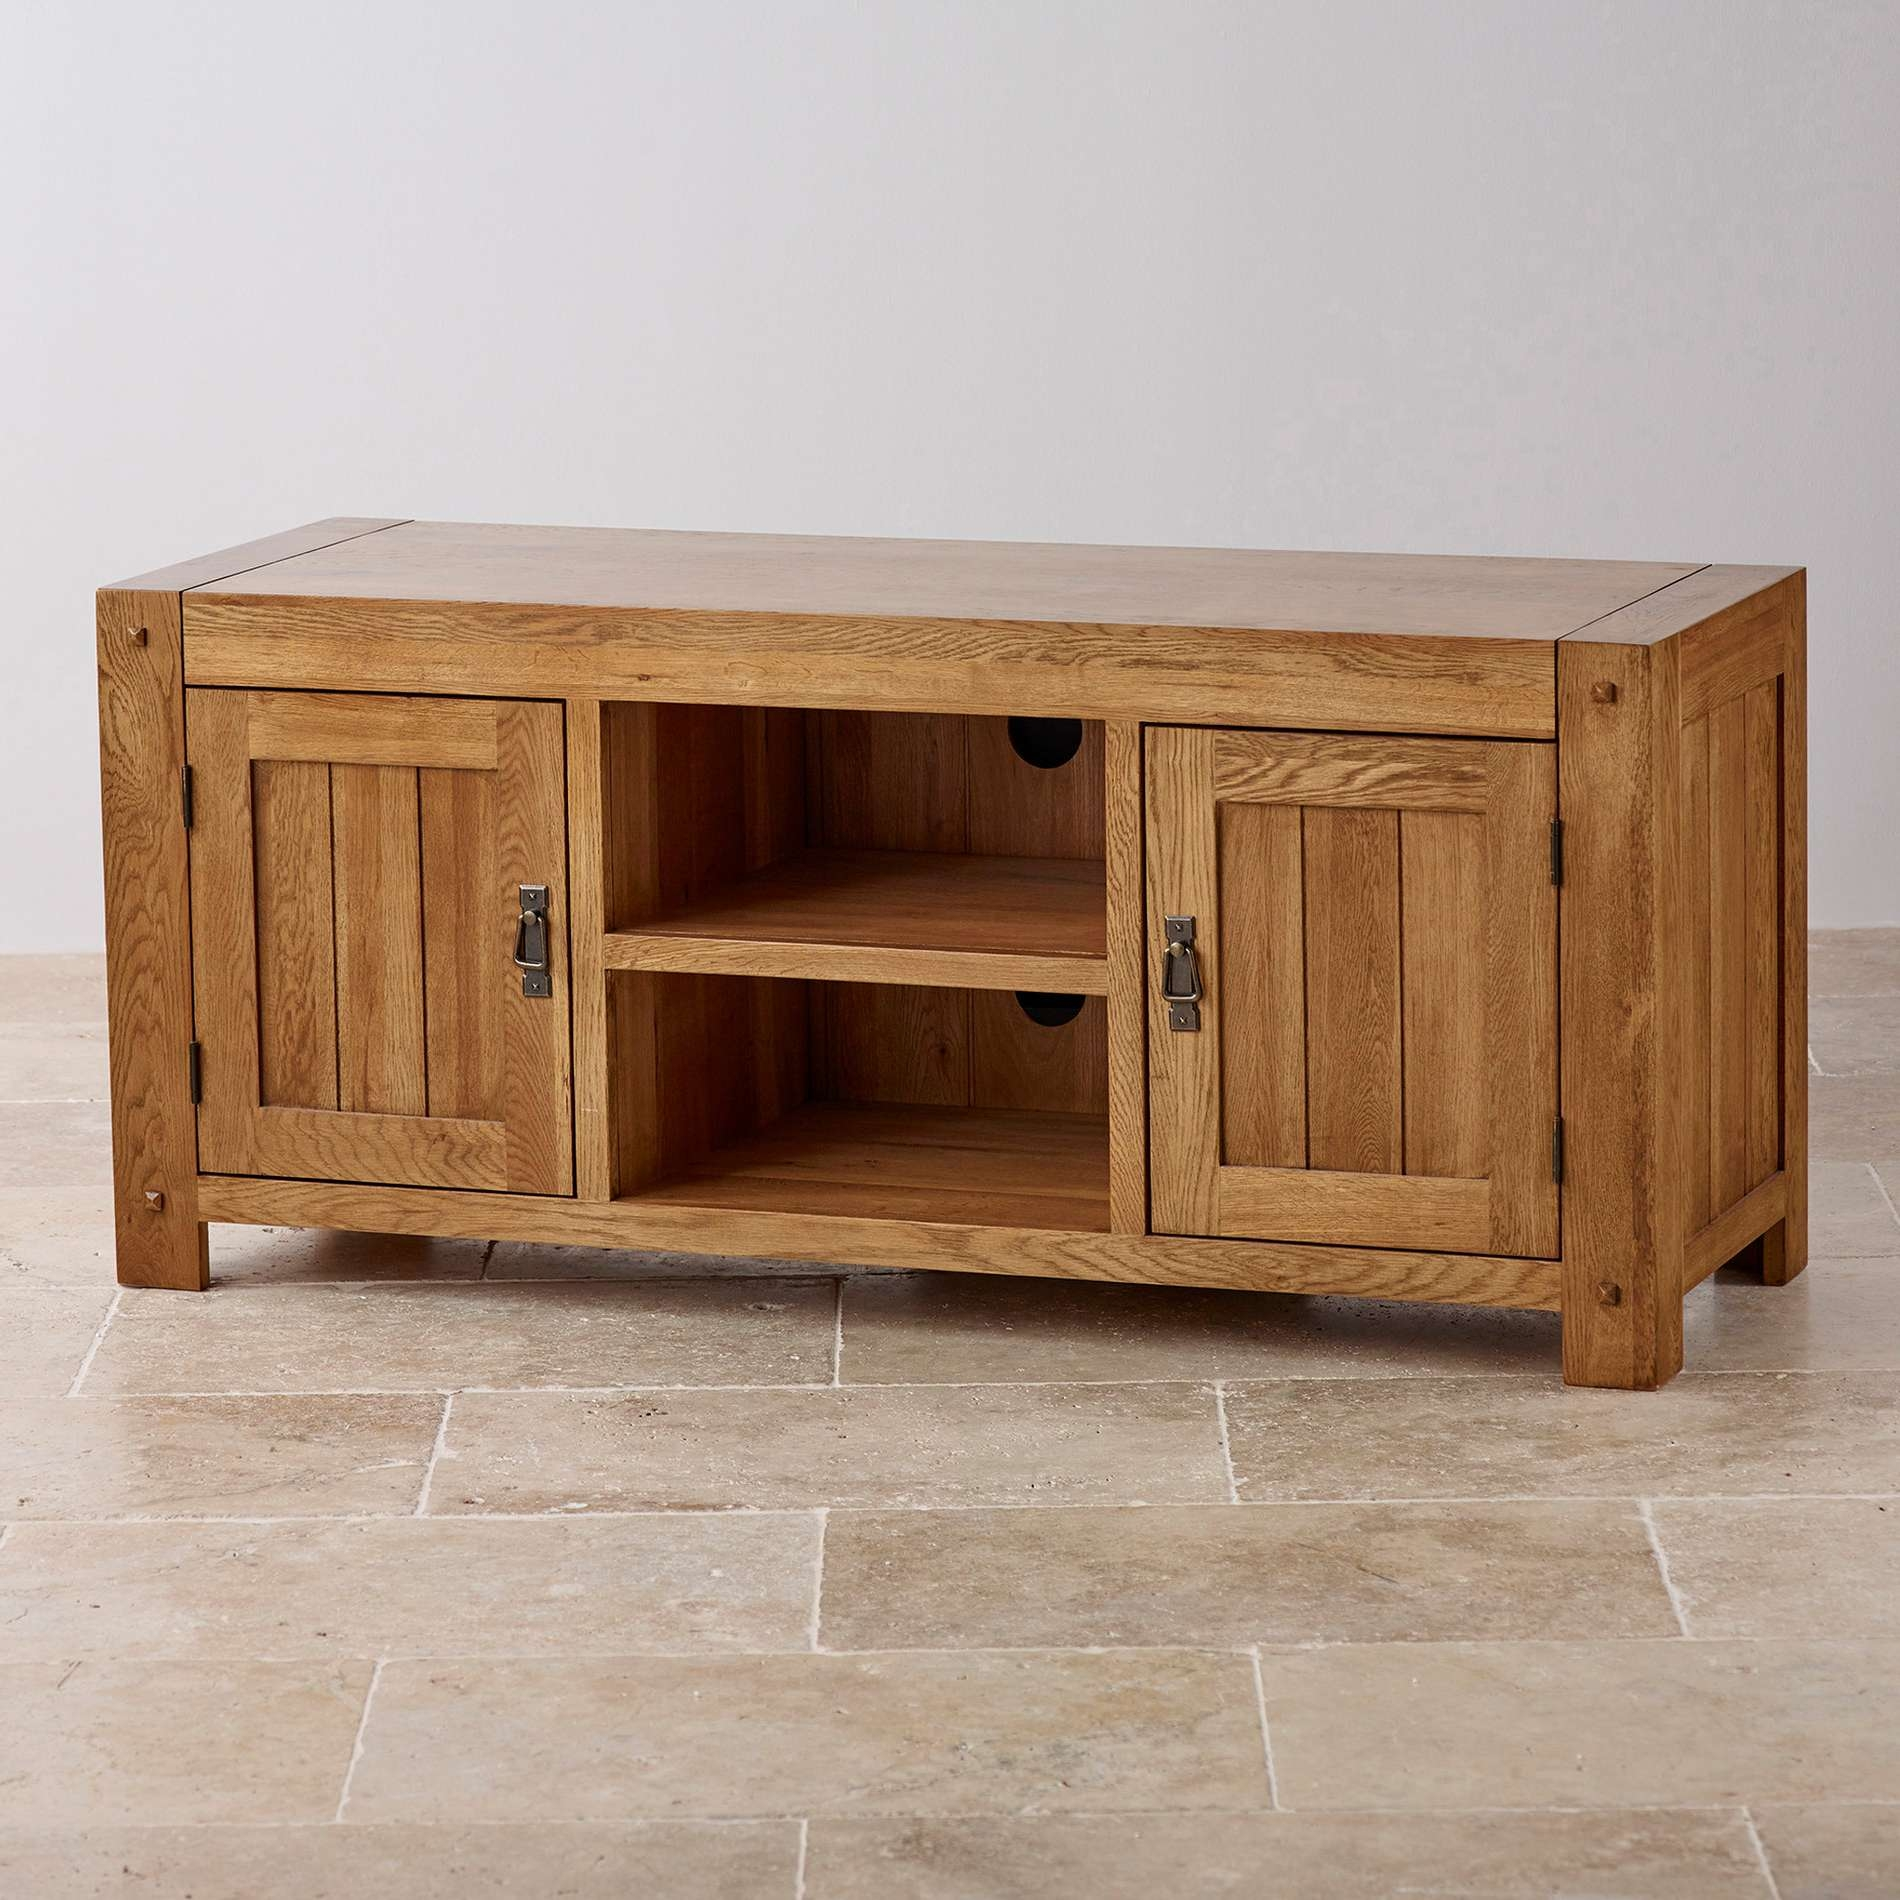 Tv Cabinets | Mango, Painted & Oak Tv Units | Oak Furniture Land For Solid Oak Tv Cabinets (View 19 of 20)